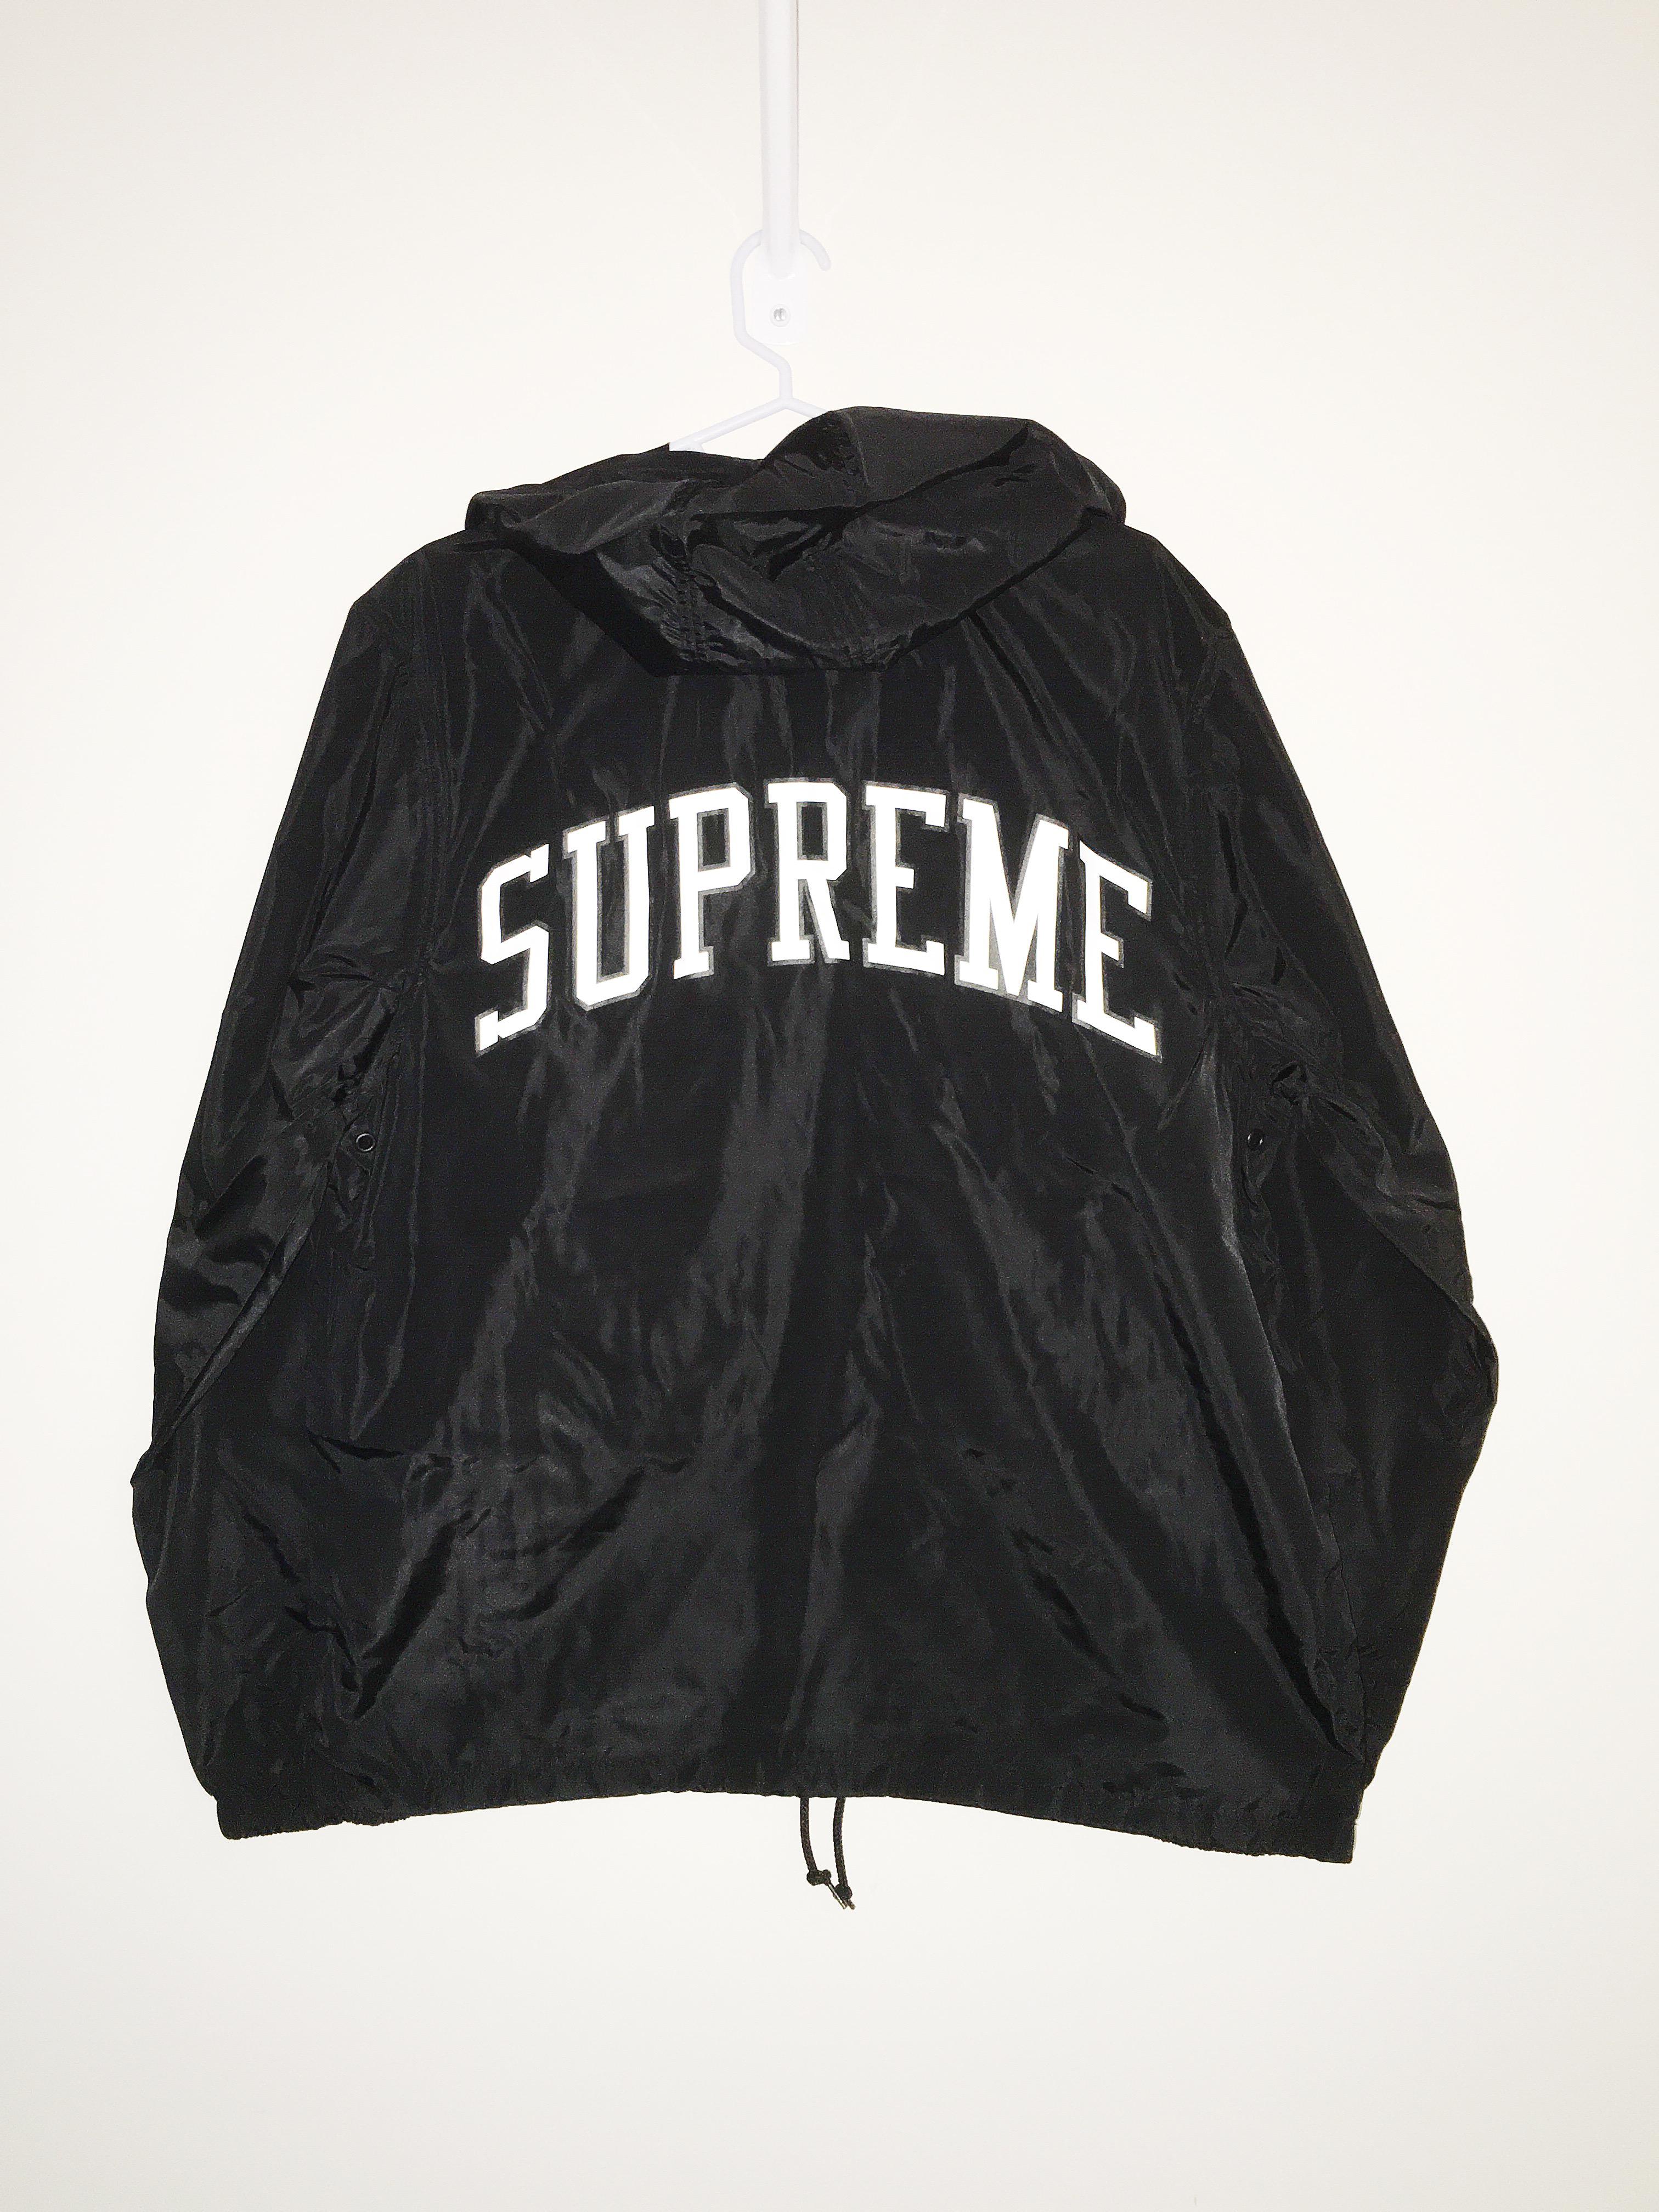 Supreme Champion Half Zip Windbreaker Black Medium Size M Light Jackets For Grailed